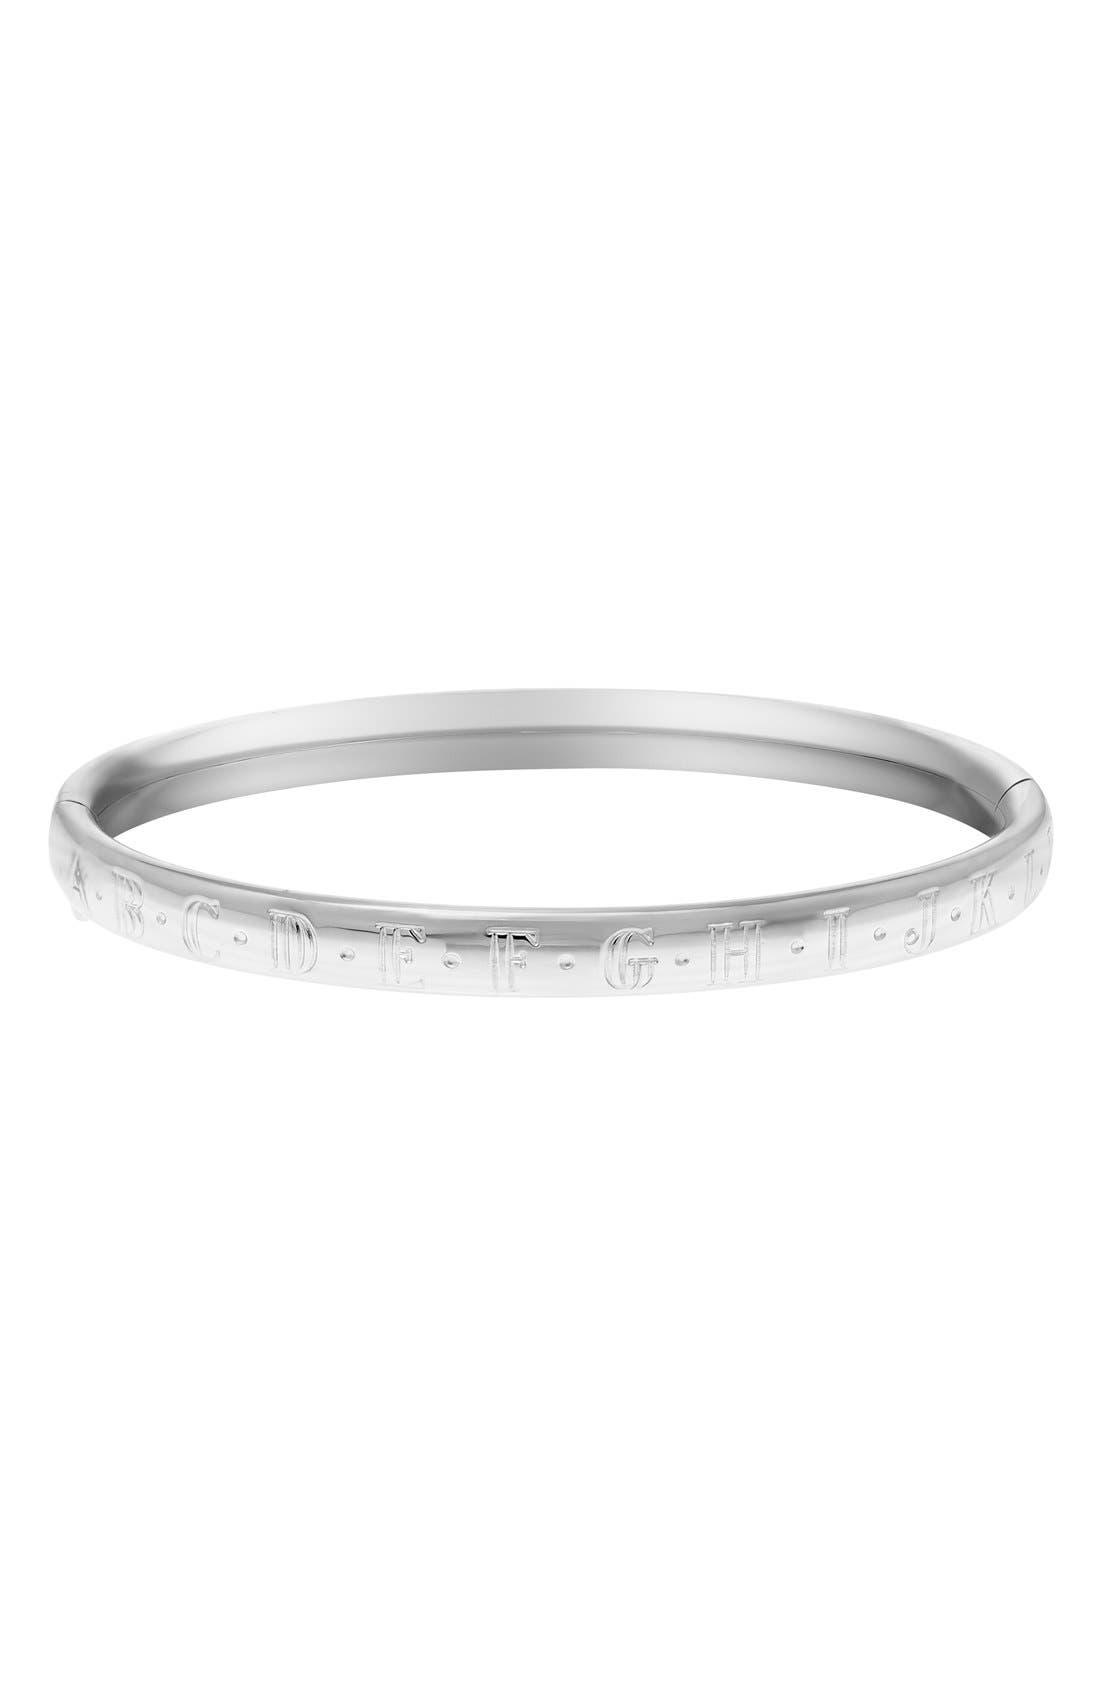 MIGNONETTE, Alphabet Sterling Silver Bracelet, Main thumbnail 1, color, STERLING SILVER